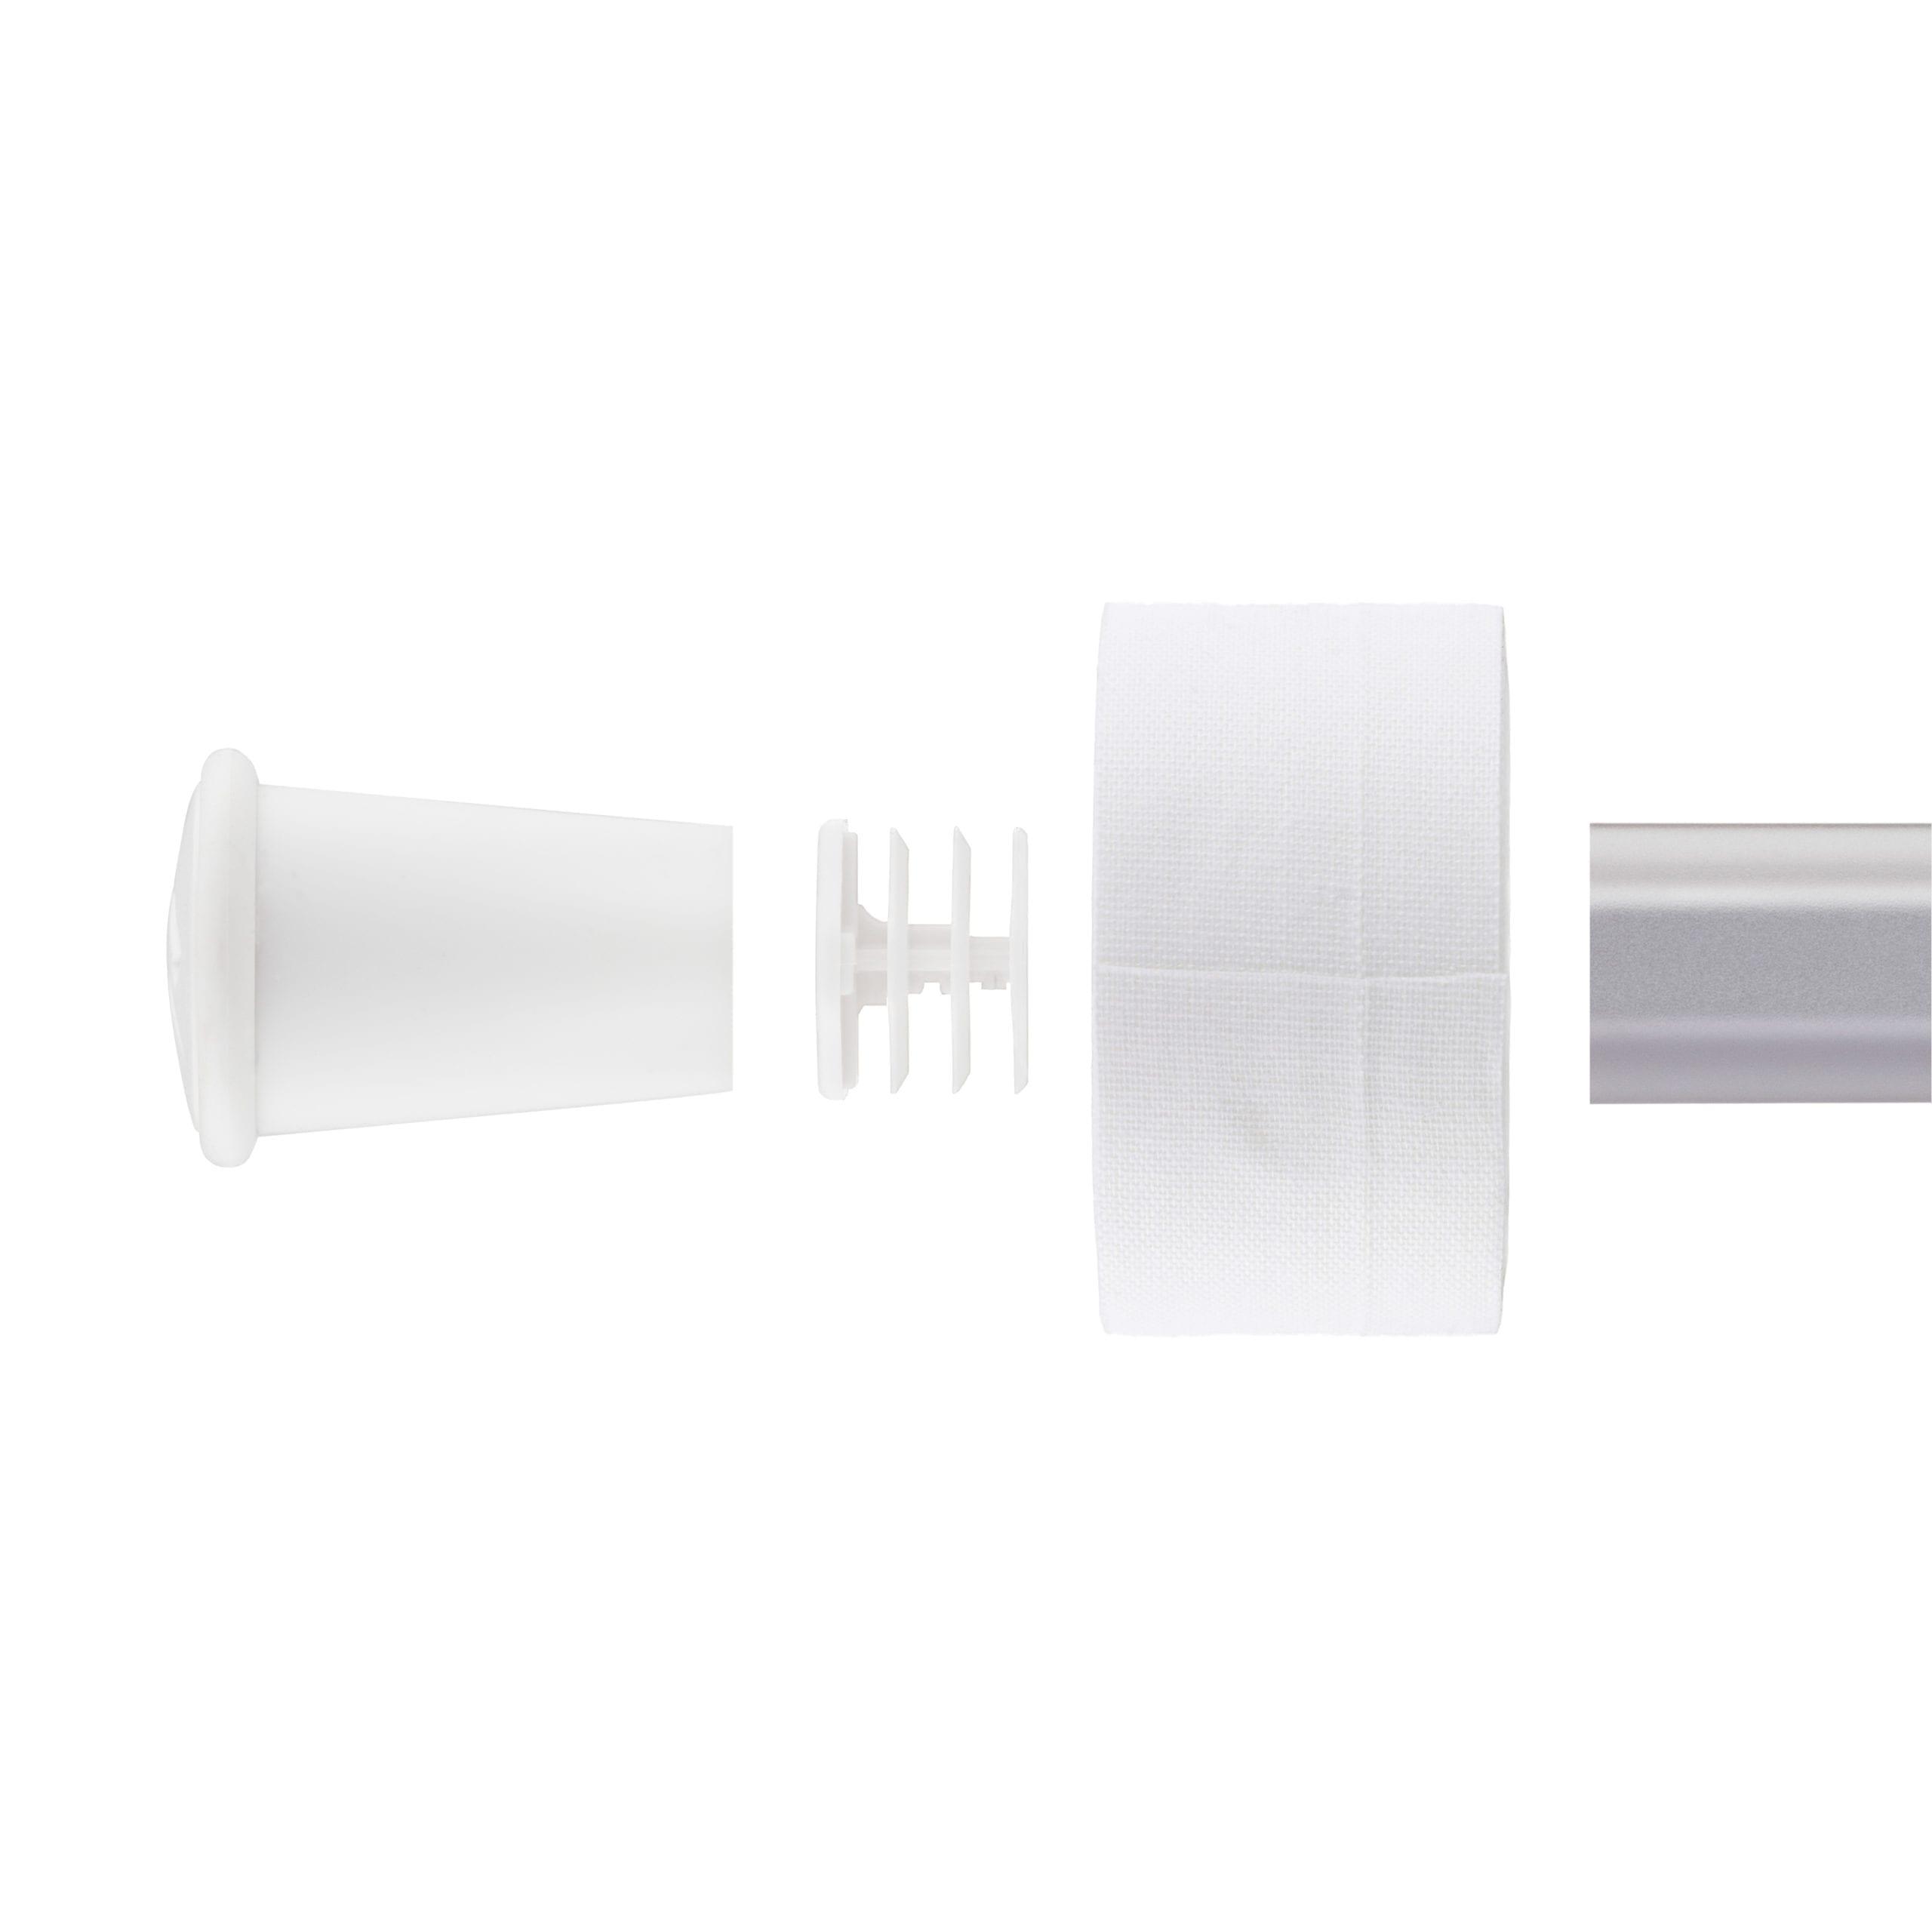 StringKing-Metal-3-Pro-Lacrosse-Shaft-Silver-Accessories-1-scaled-1.jpg